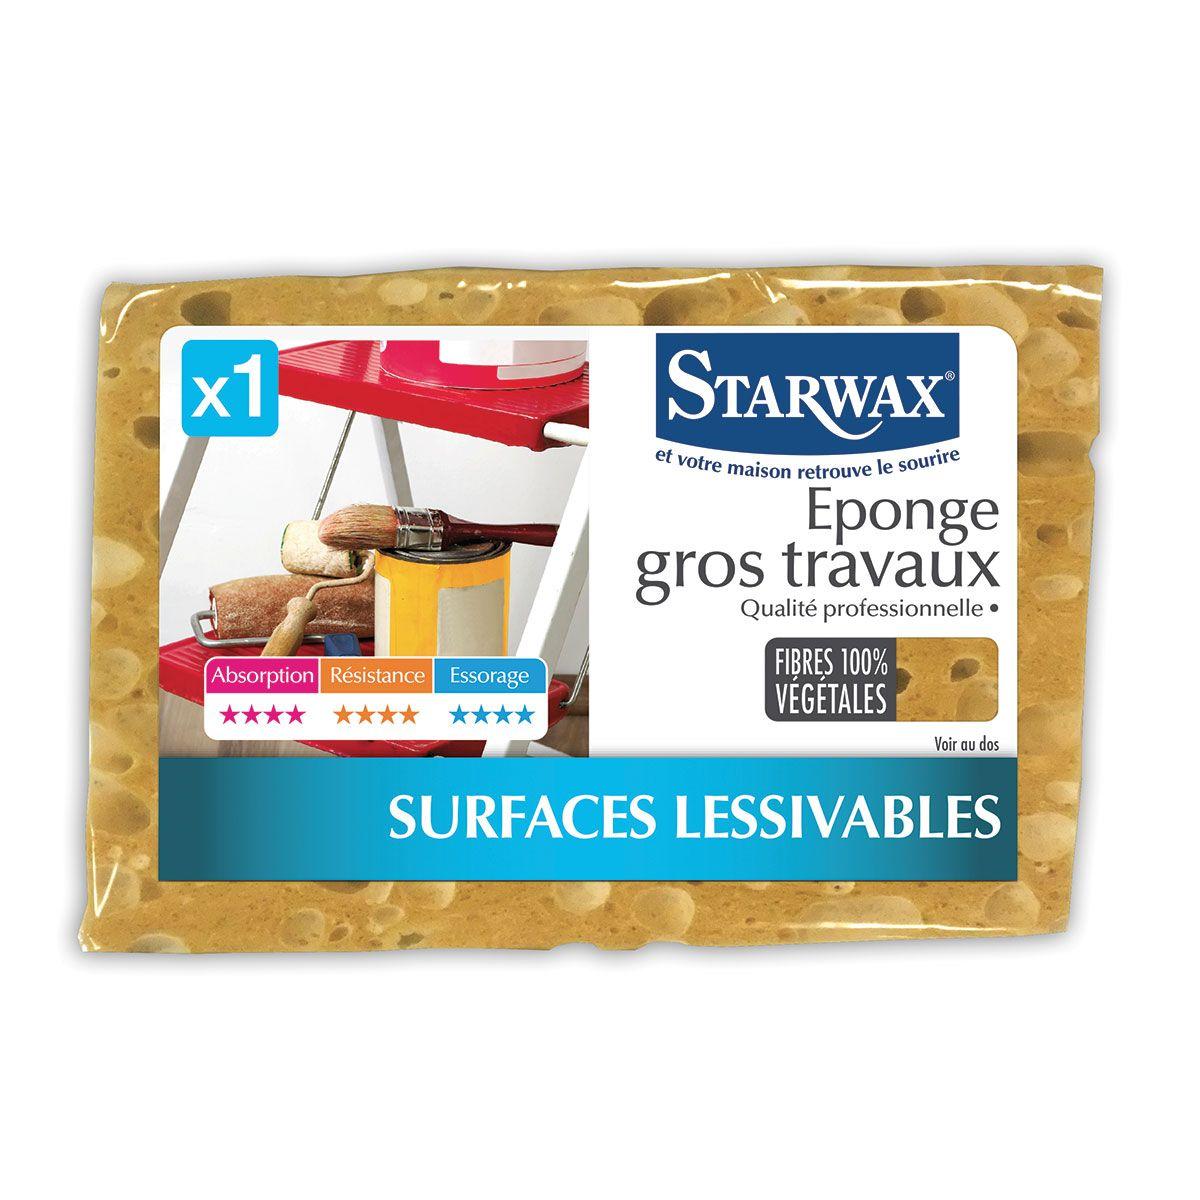 Eponge gros travaux - Starwax